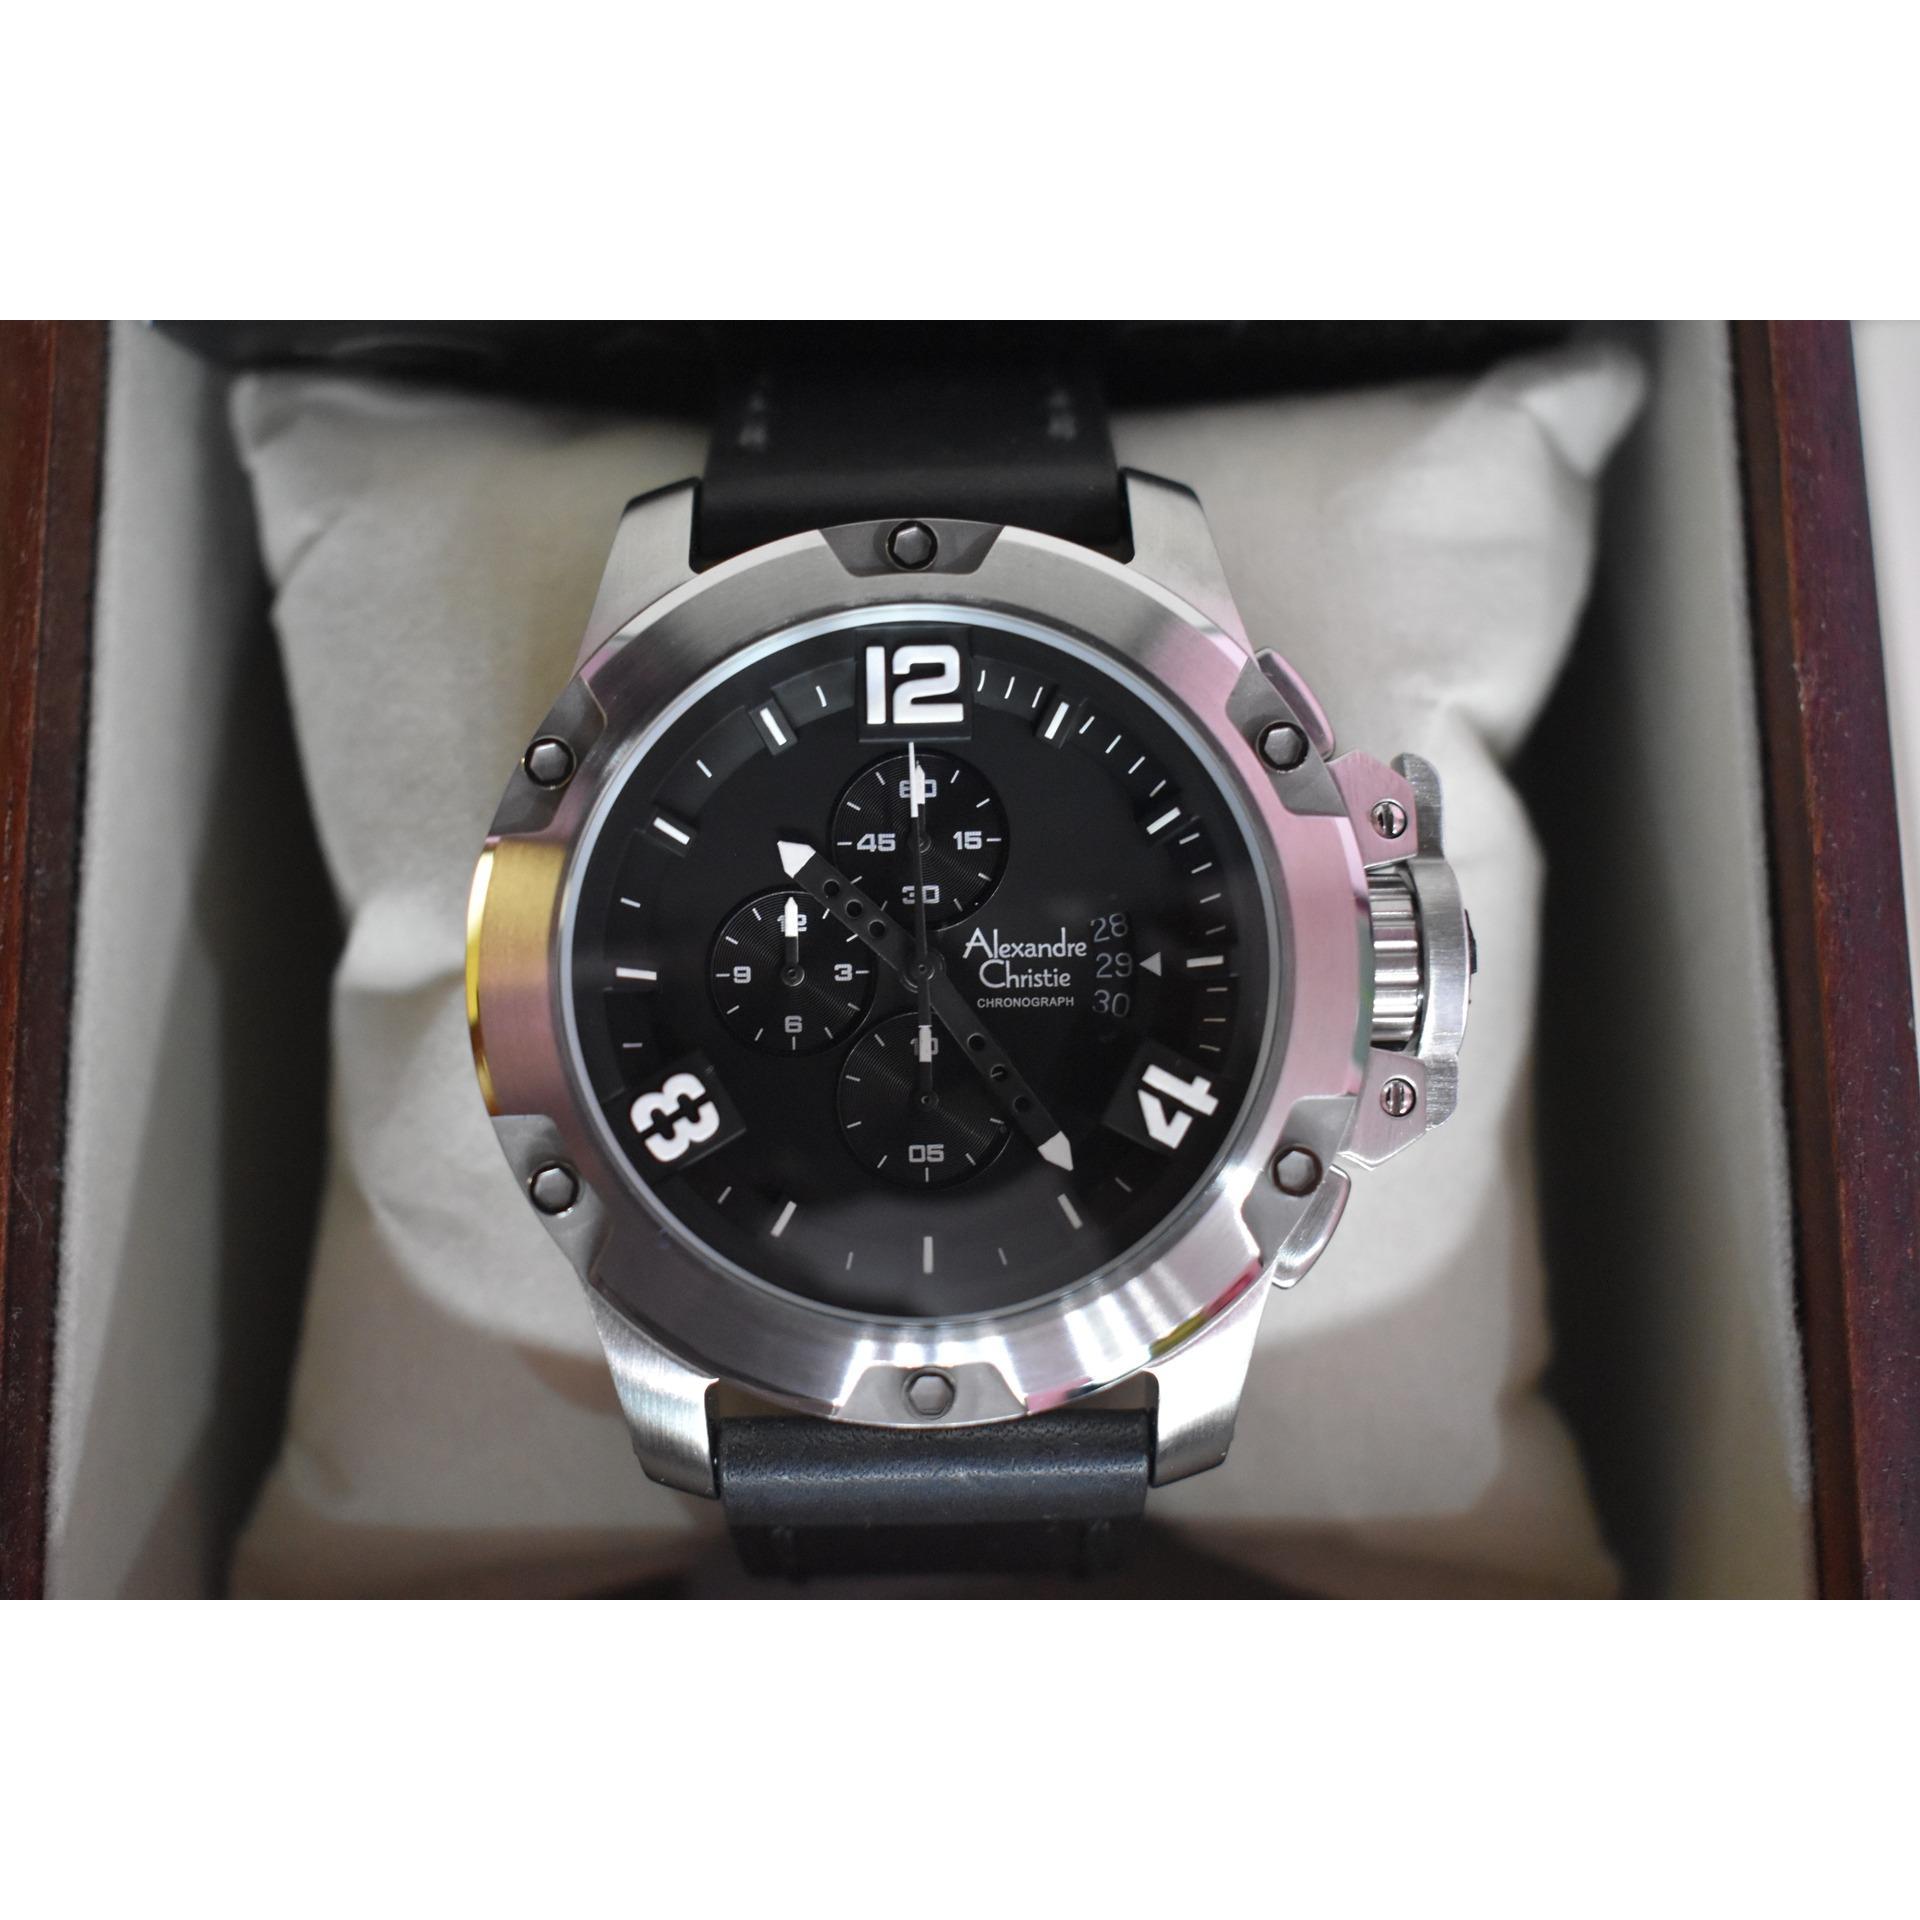 Jam Tangan Alexandre Christie AC 6295 MC AC6295 Silver Black Leather